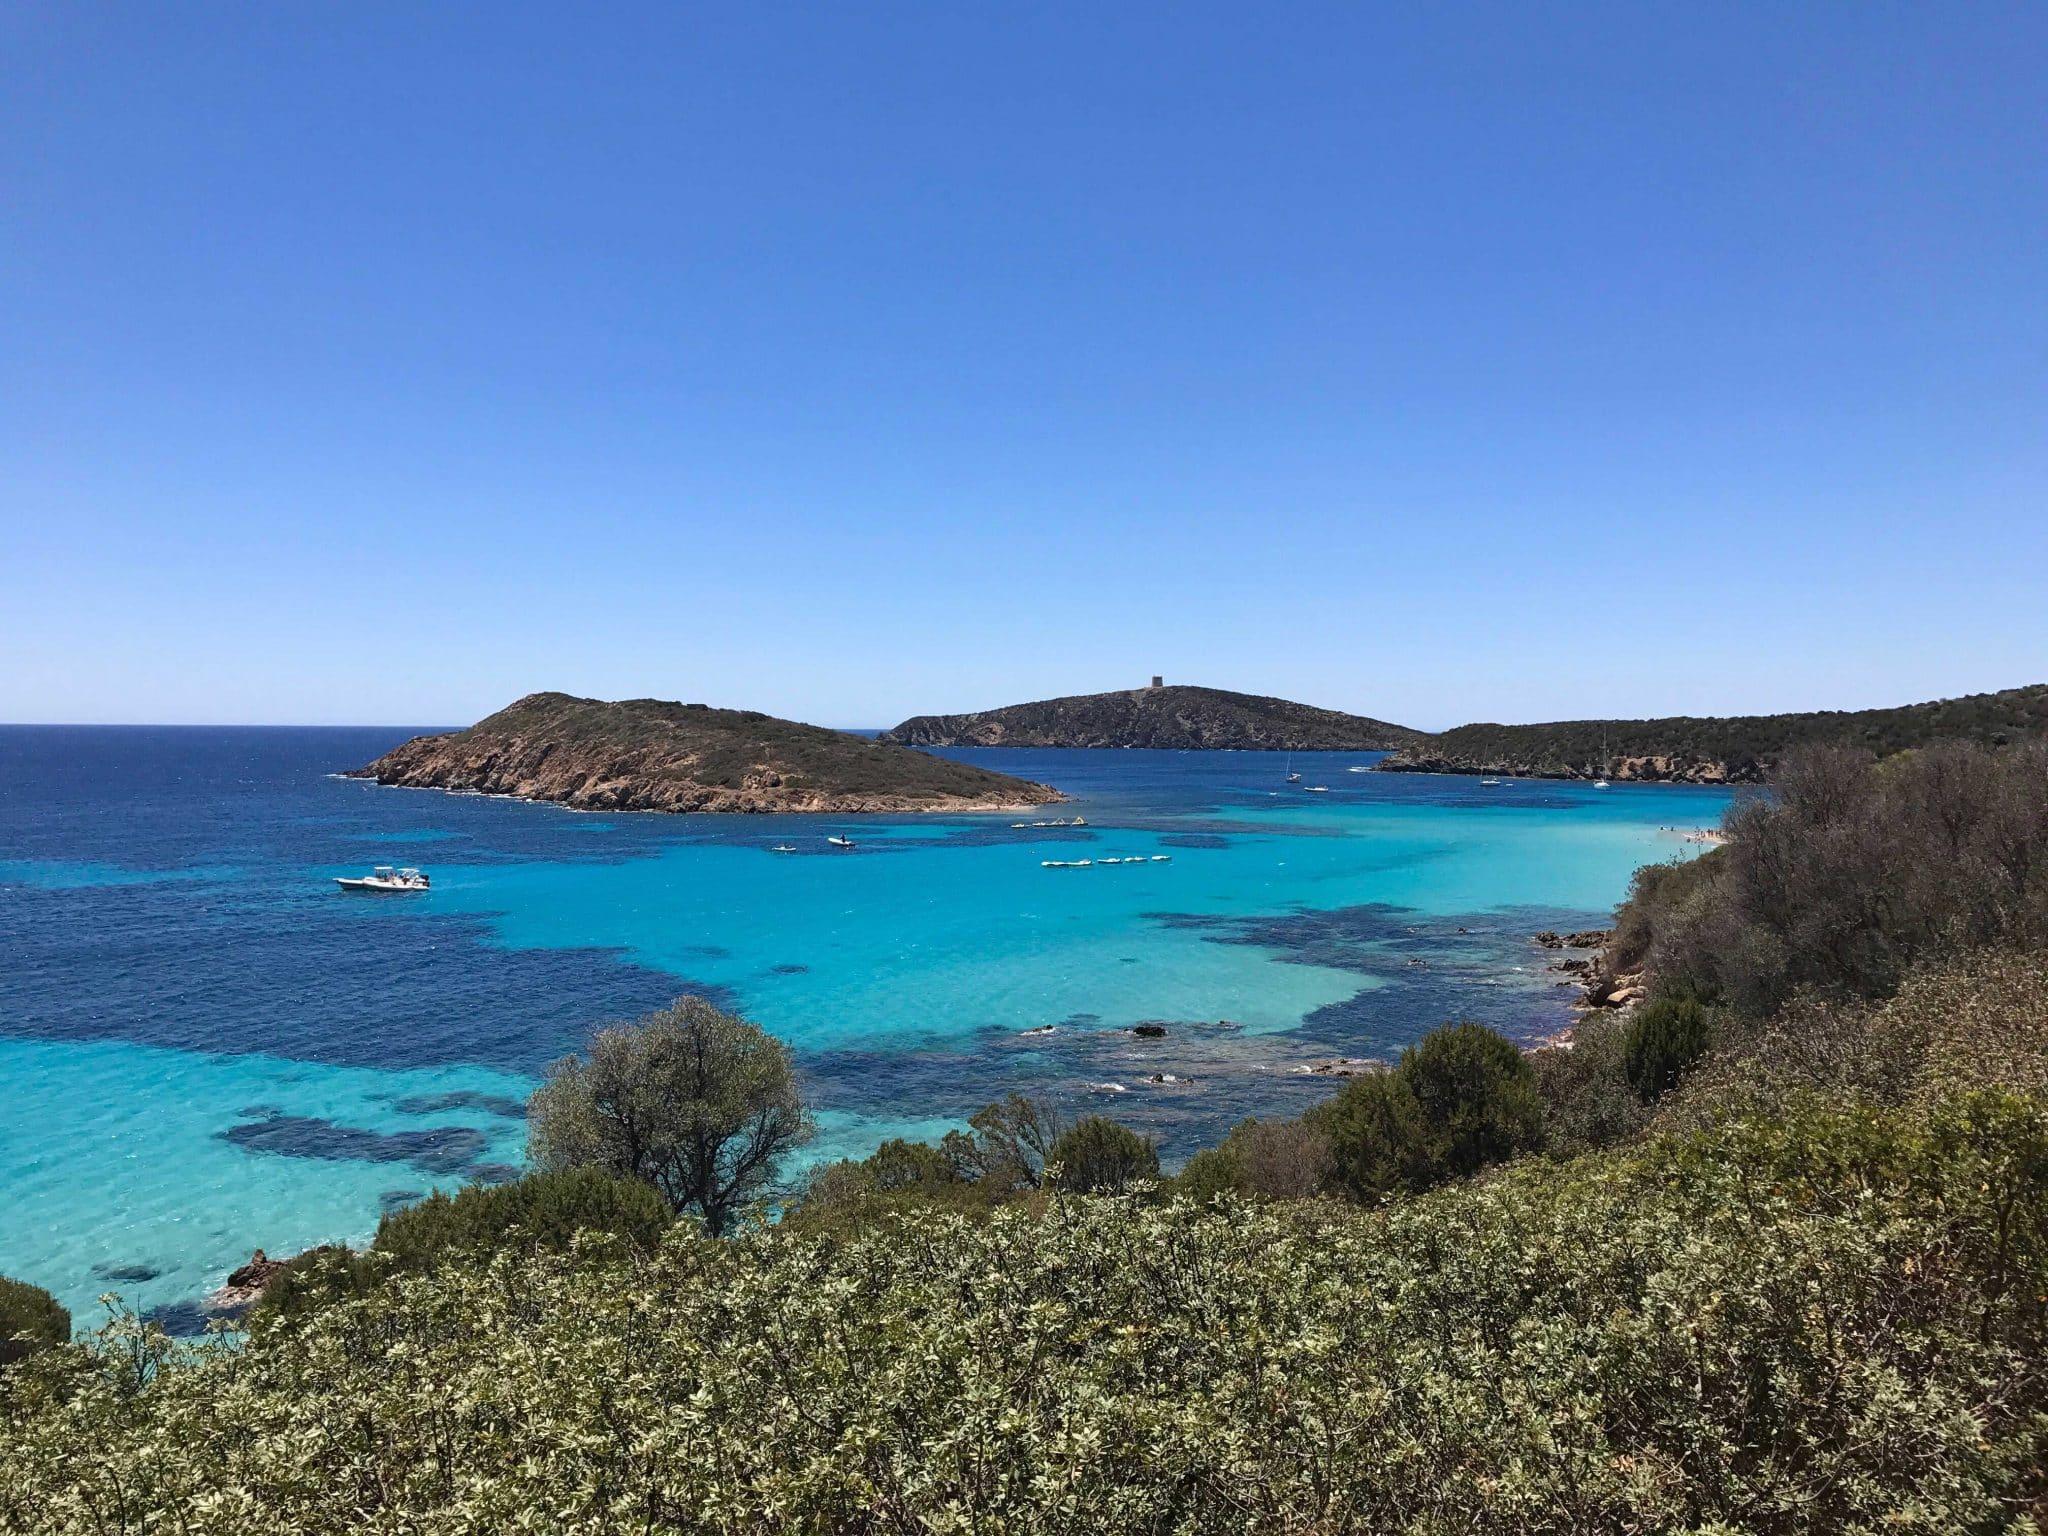 Sardiniens strande - se de smukke strande, vi besøgte på Sardinien. Chia, Teulada, Pula, Nora, Villasimius, Olbia